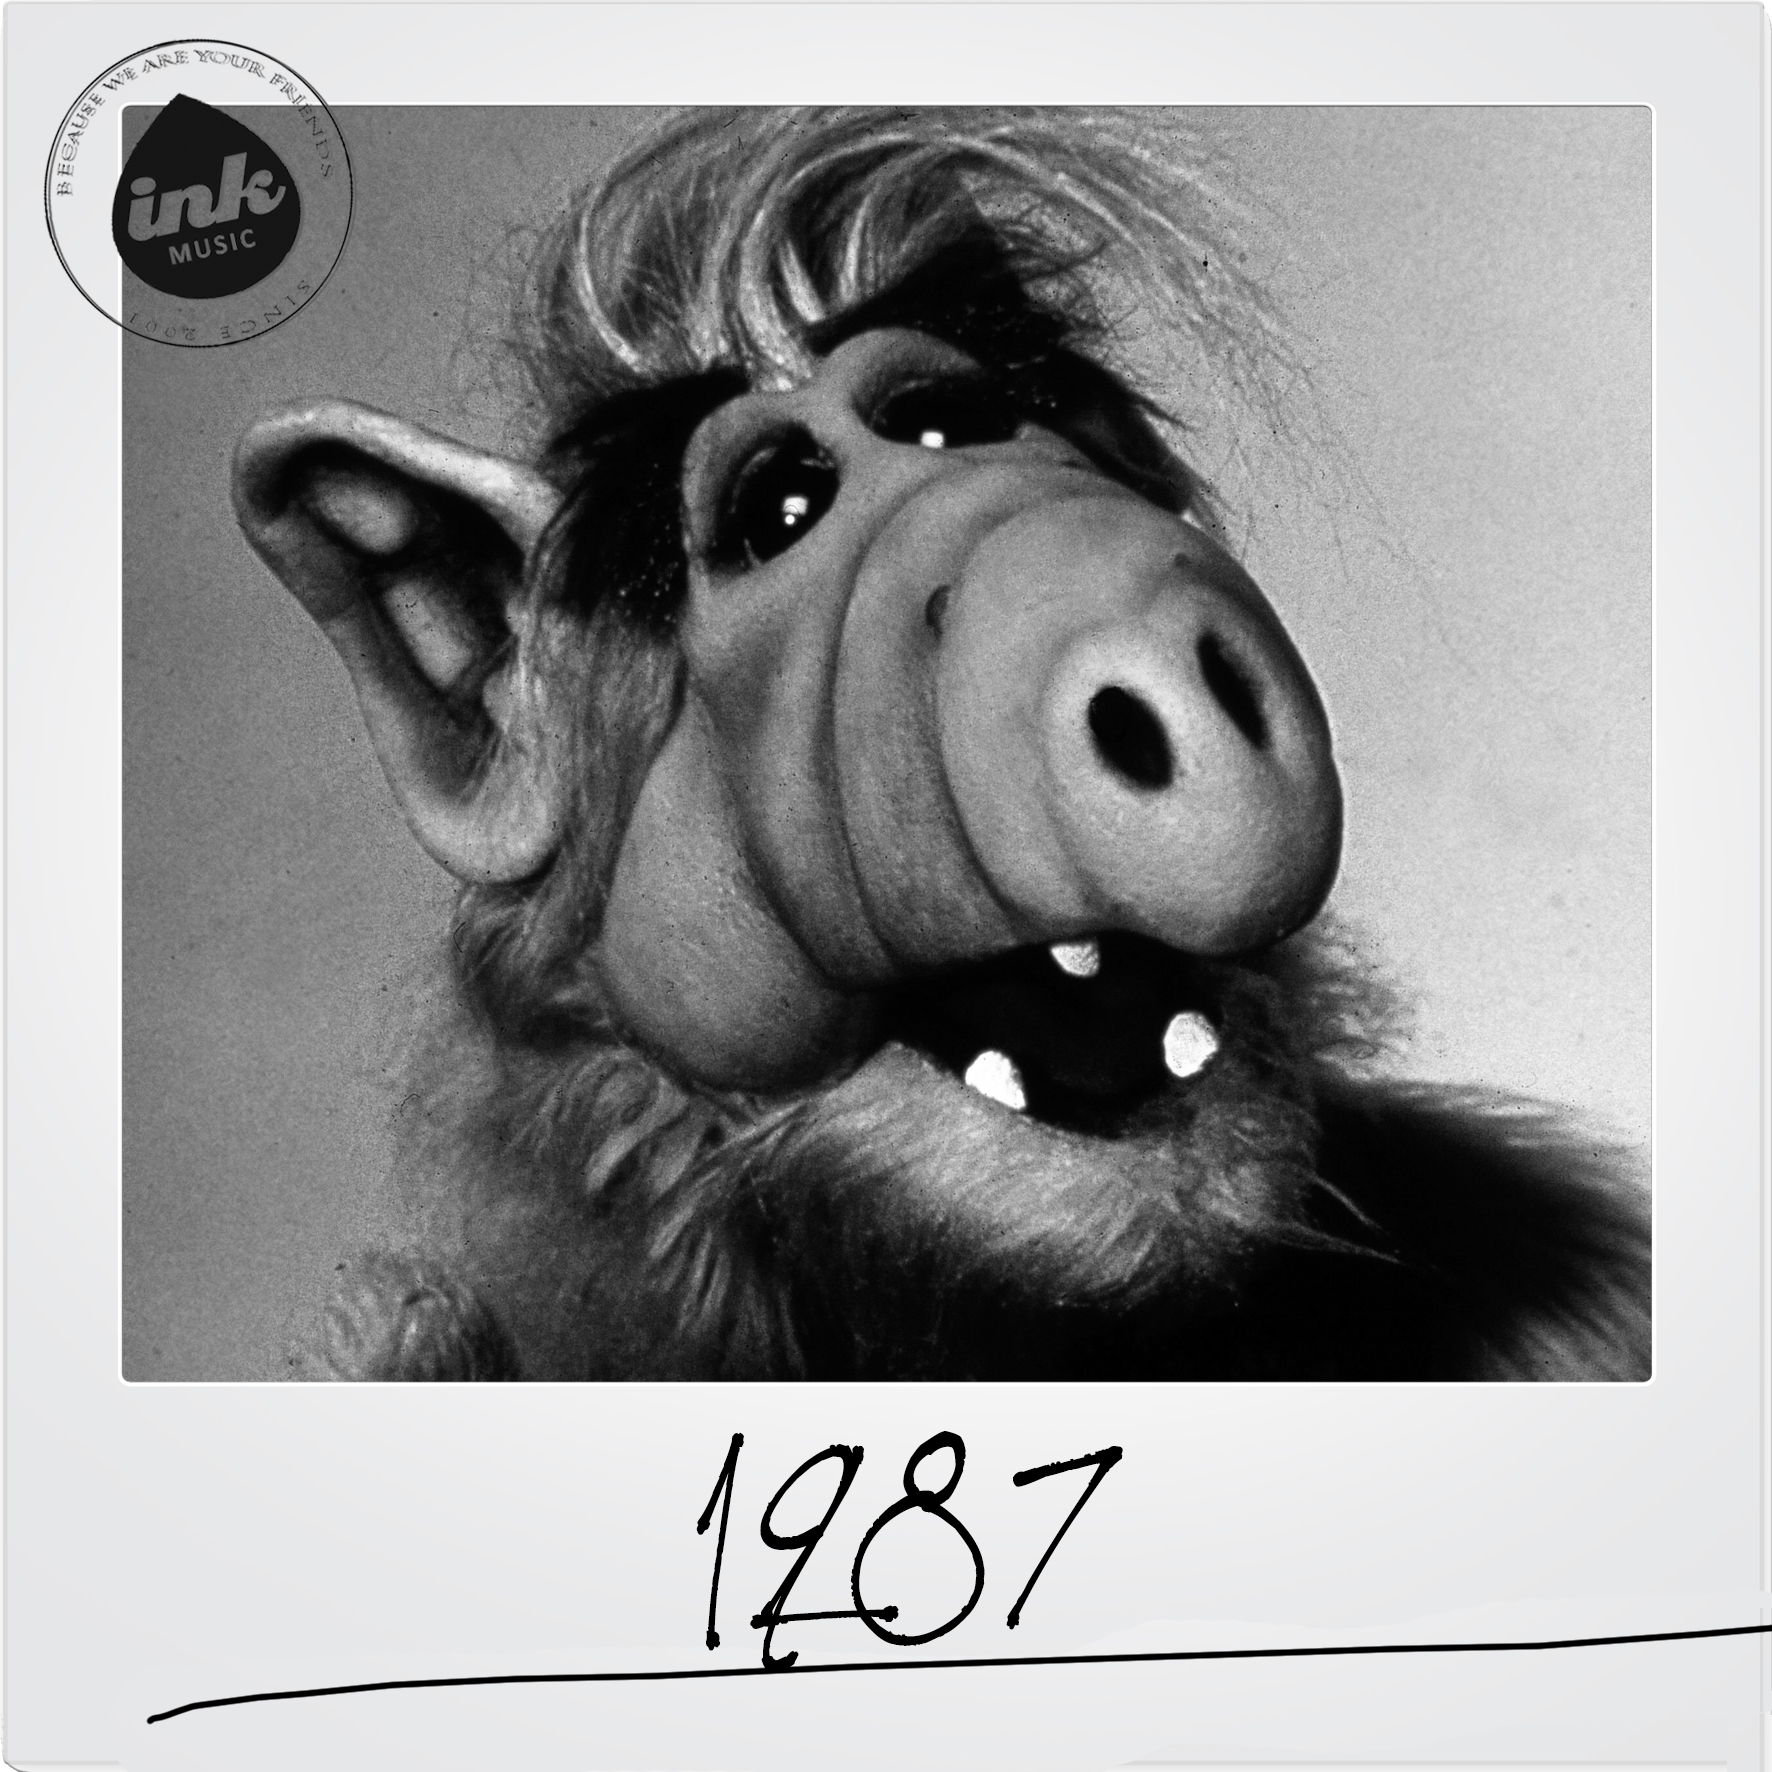 polaroid_spotify_yearlist-1987